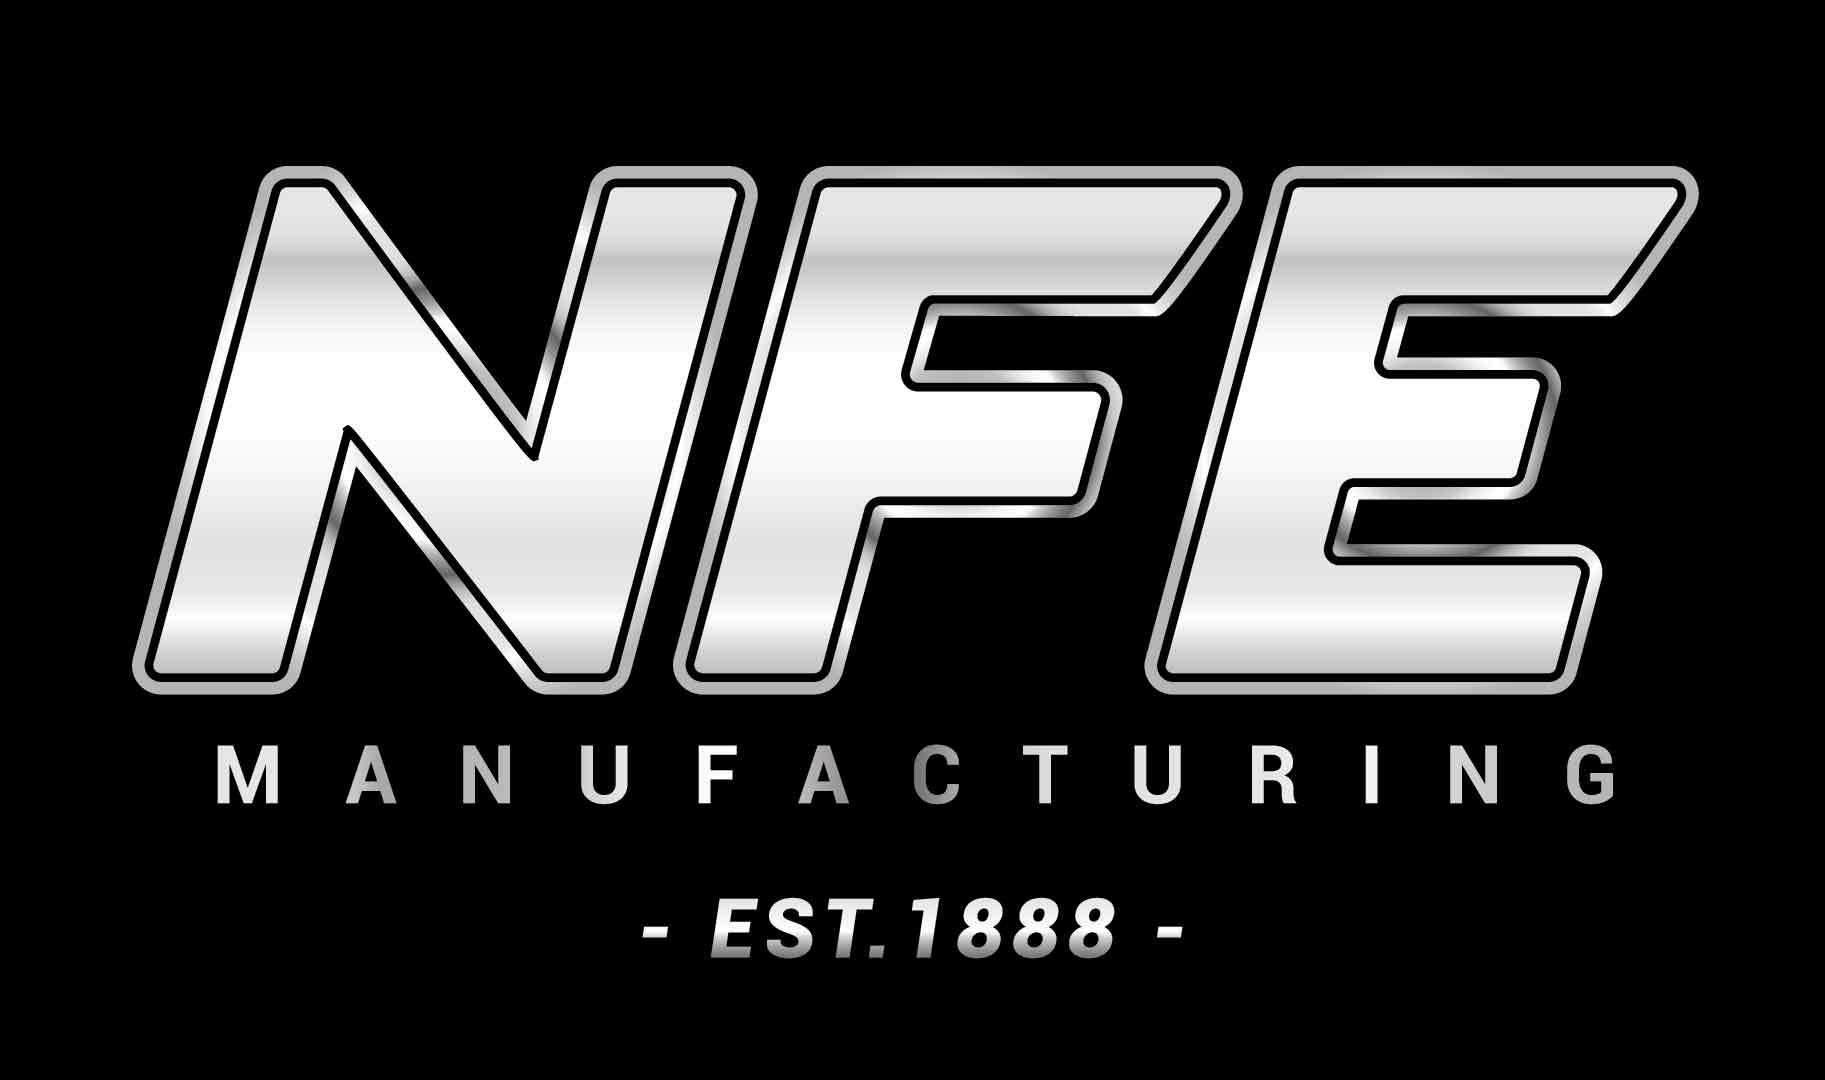 nfe_logo_blk_bg (1)